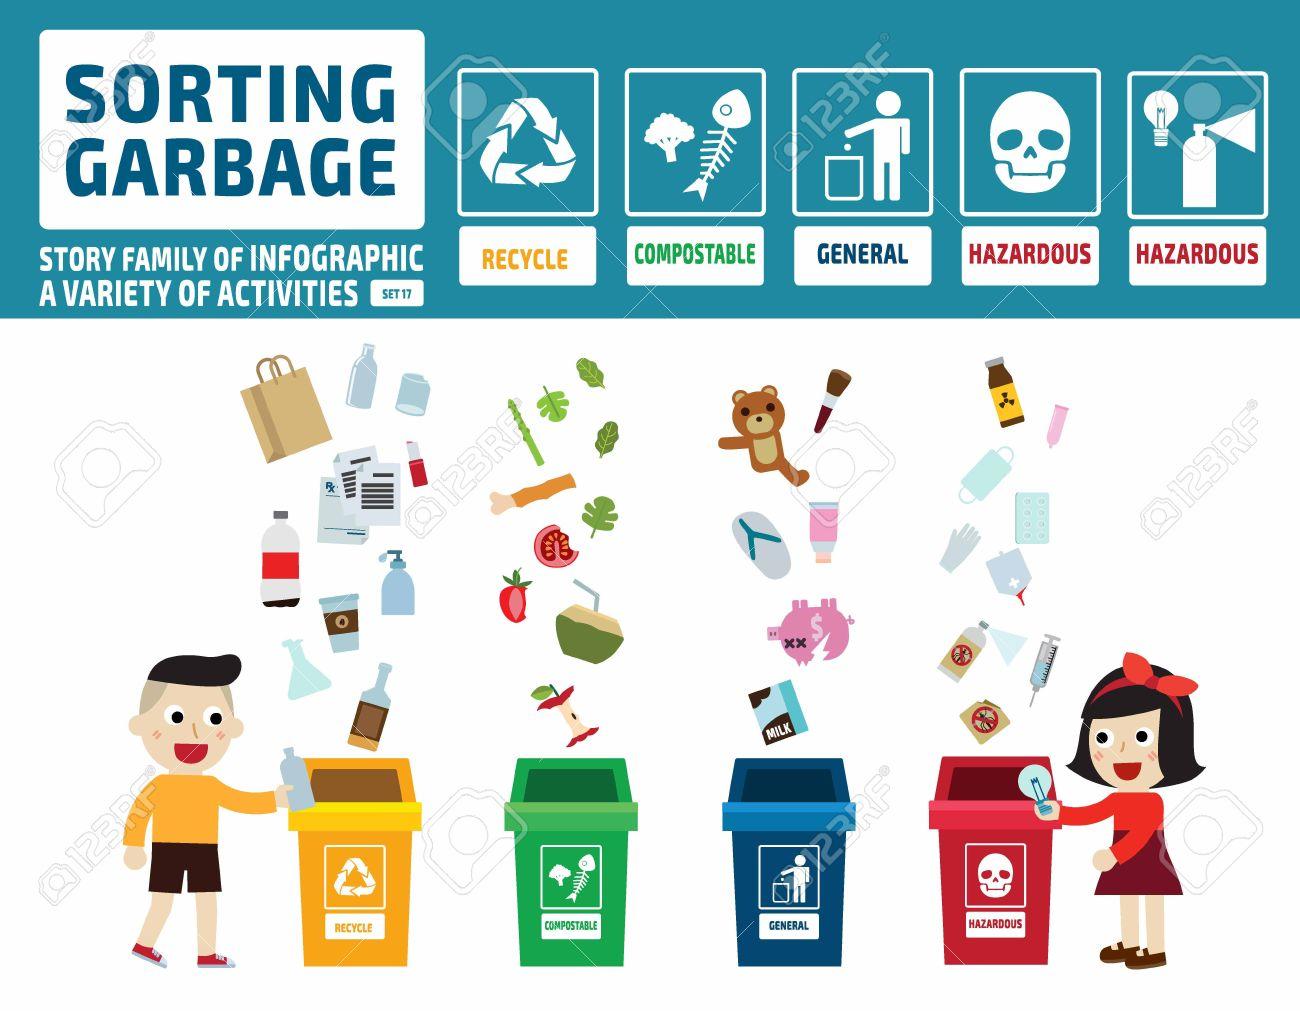 children litter.separation recycling bins with organic.waste segregation management concept.infographic elements.flat cute cartoon design illustration. - 53903246